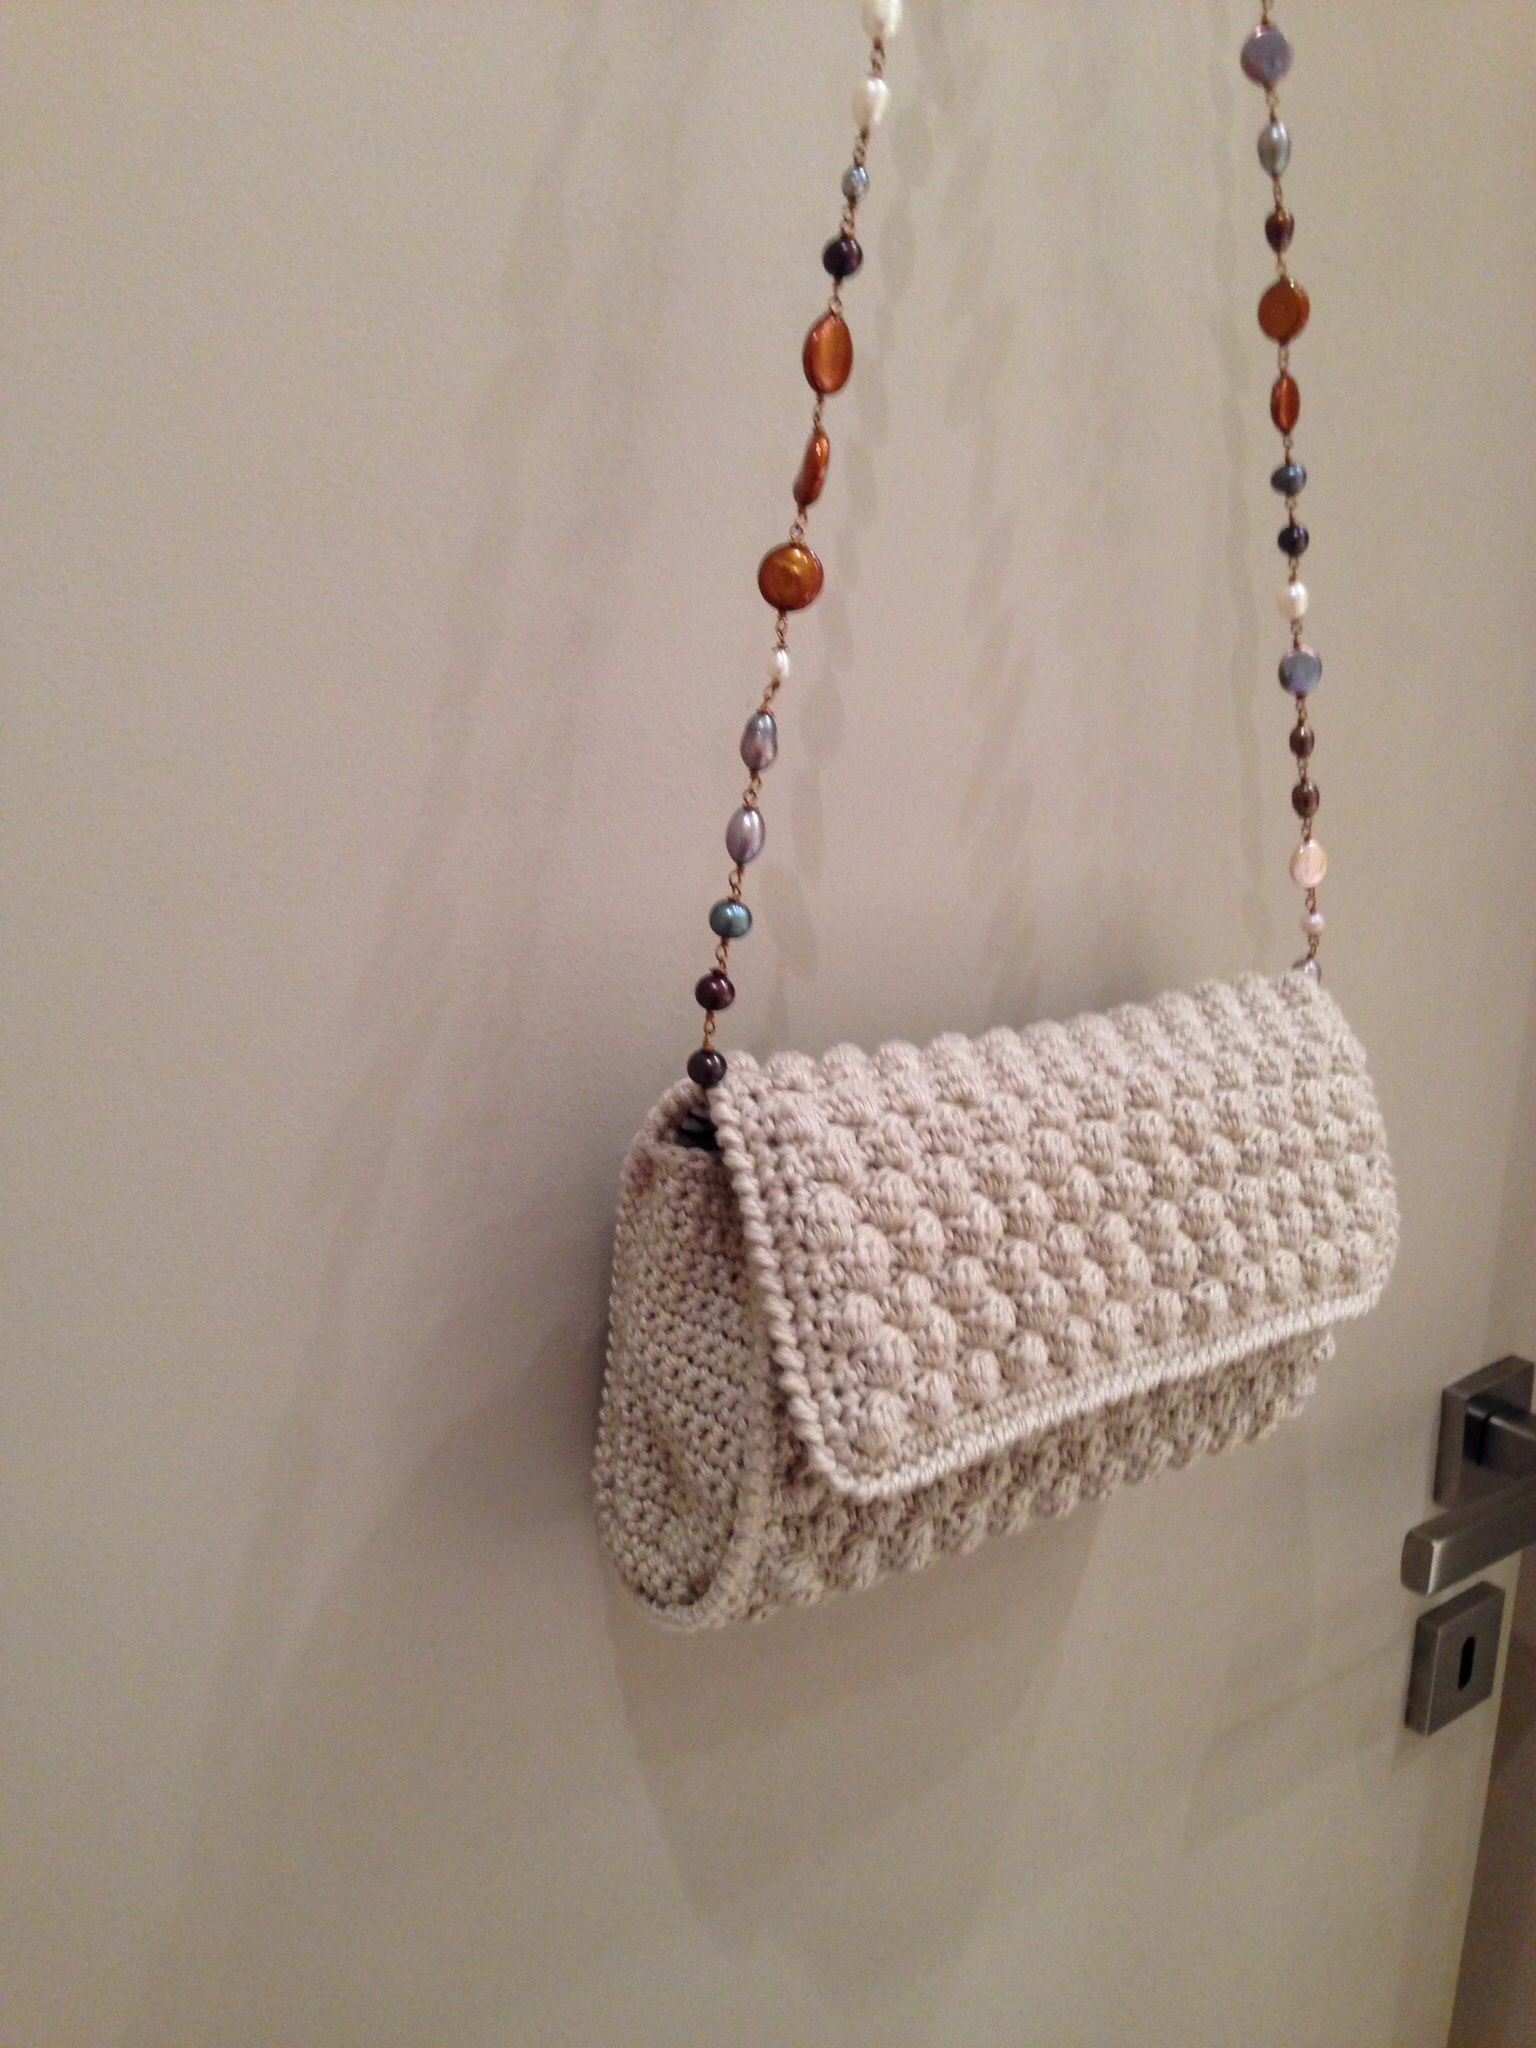 Cotone e collana perle